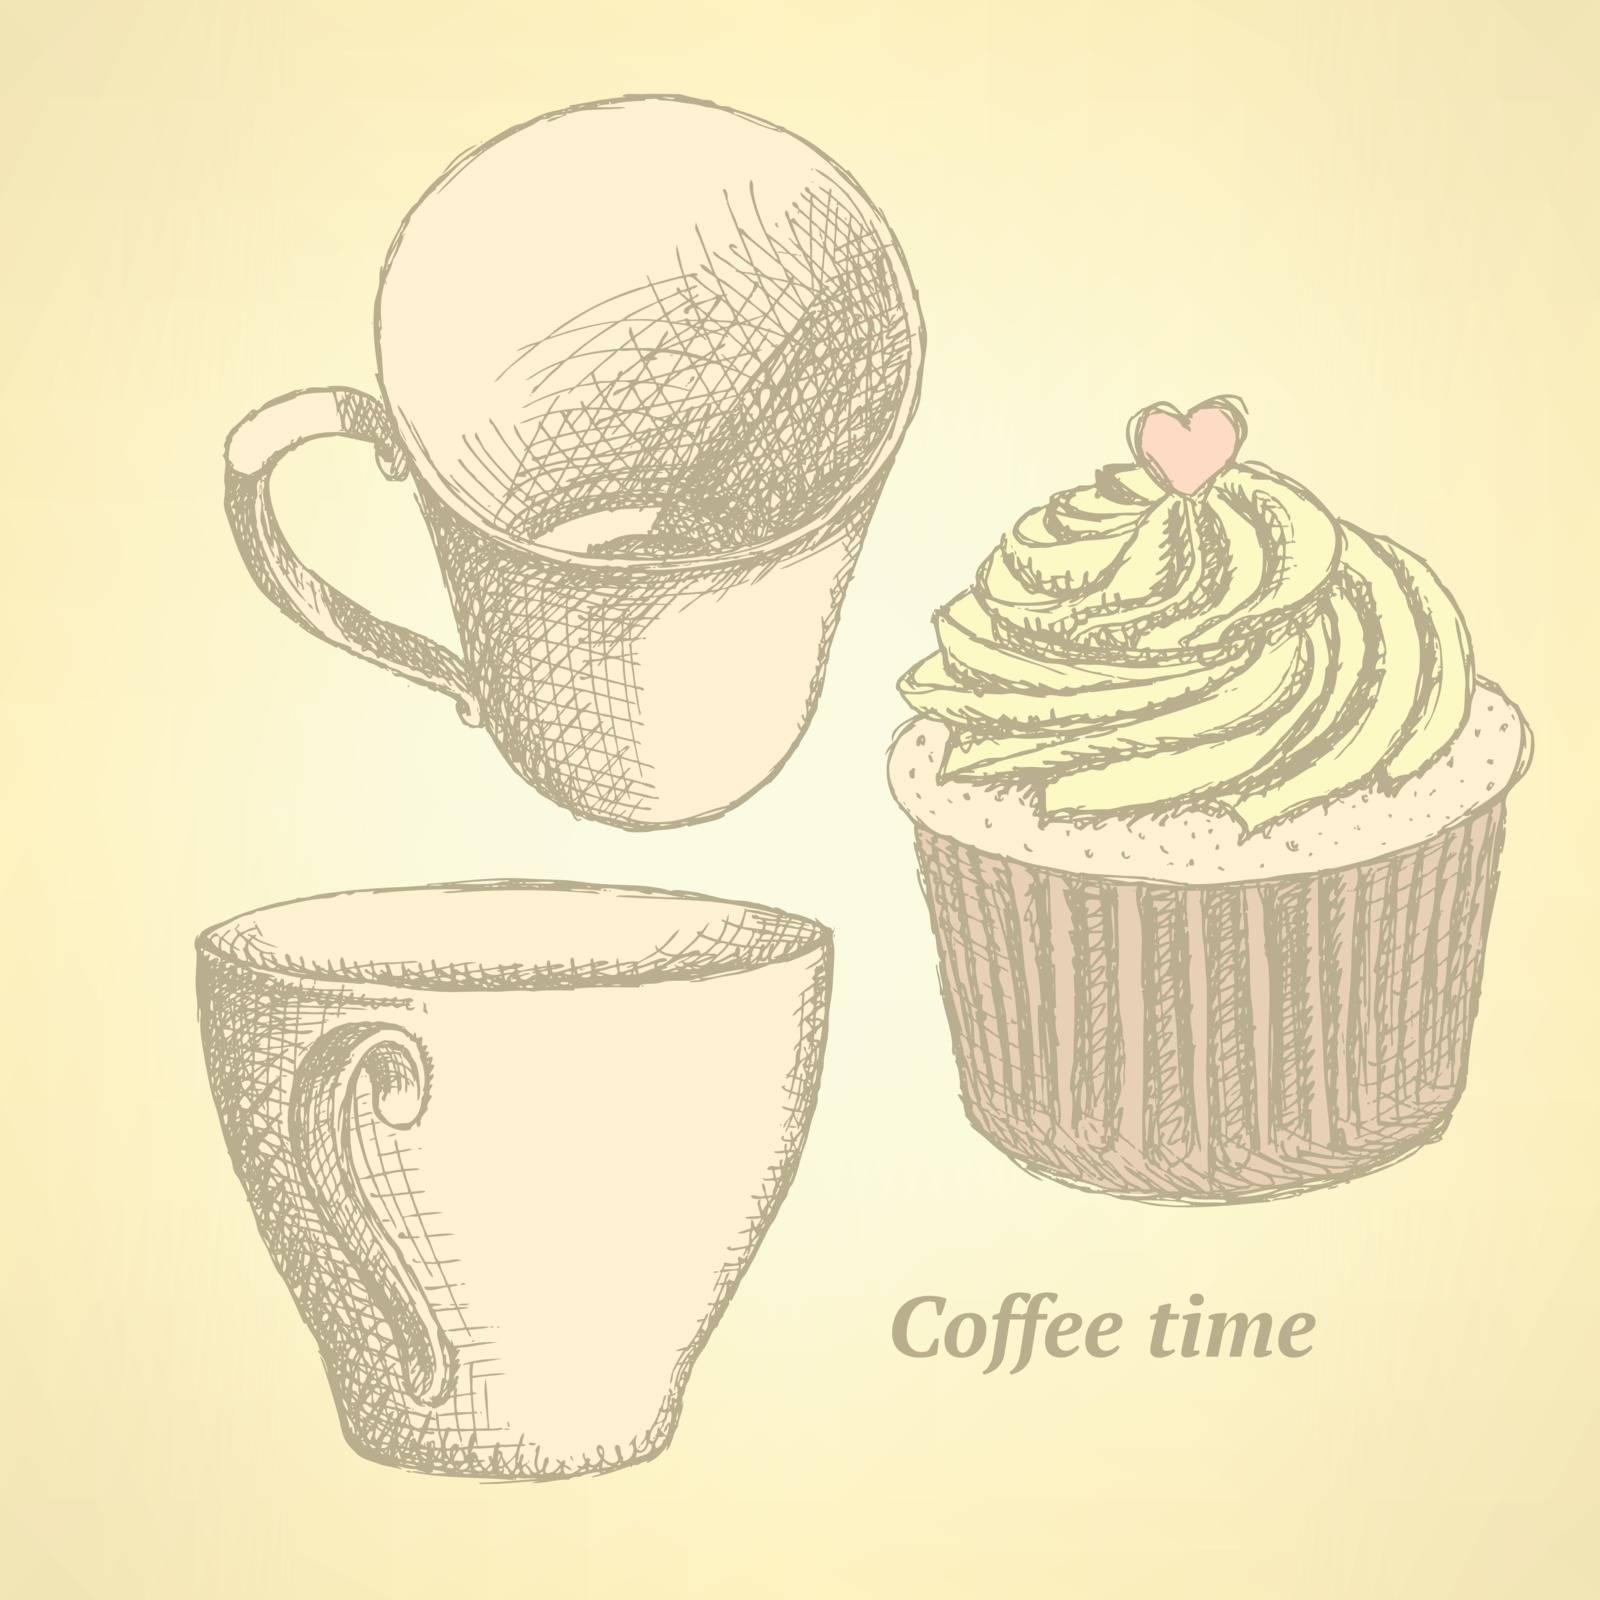 Sketch coffee set in vintage style, vector